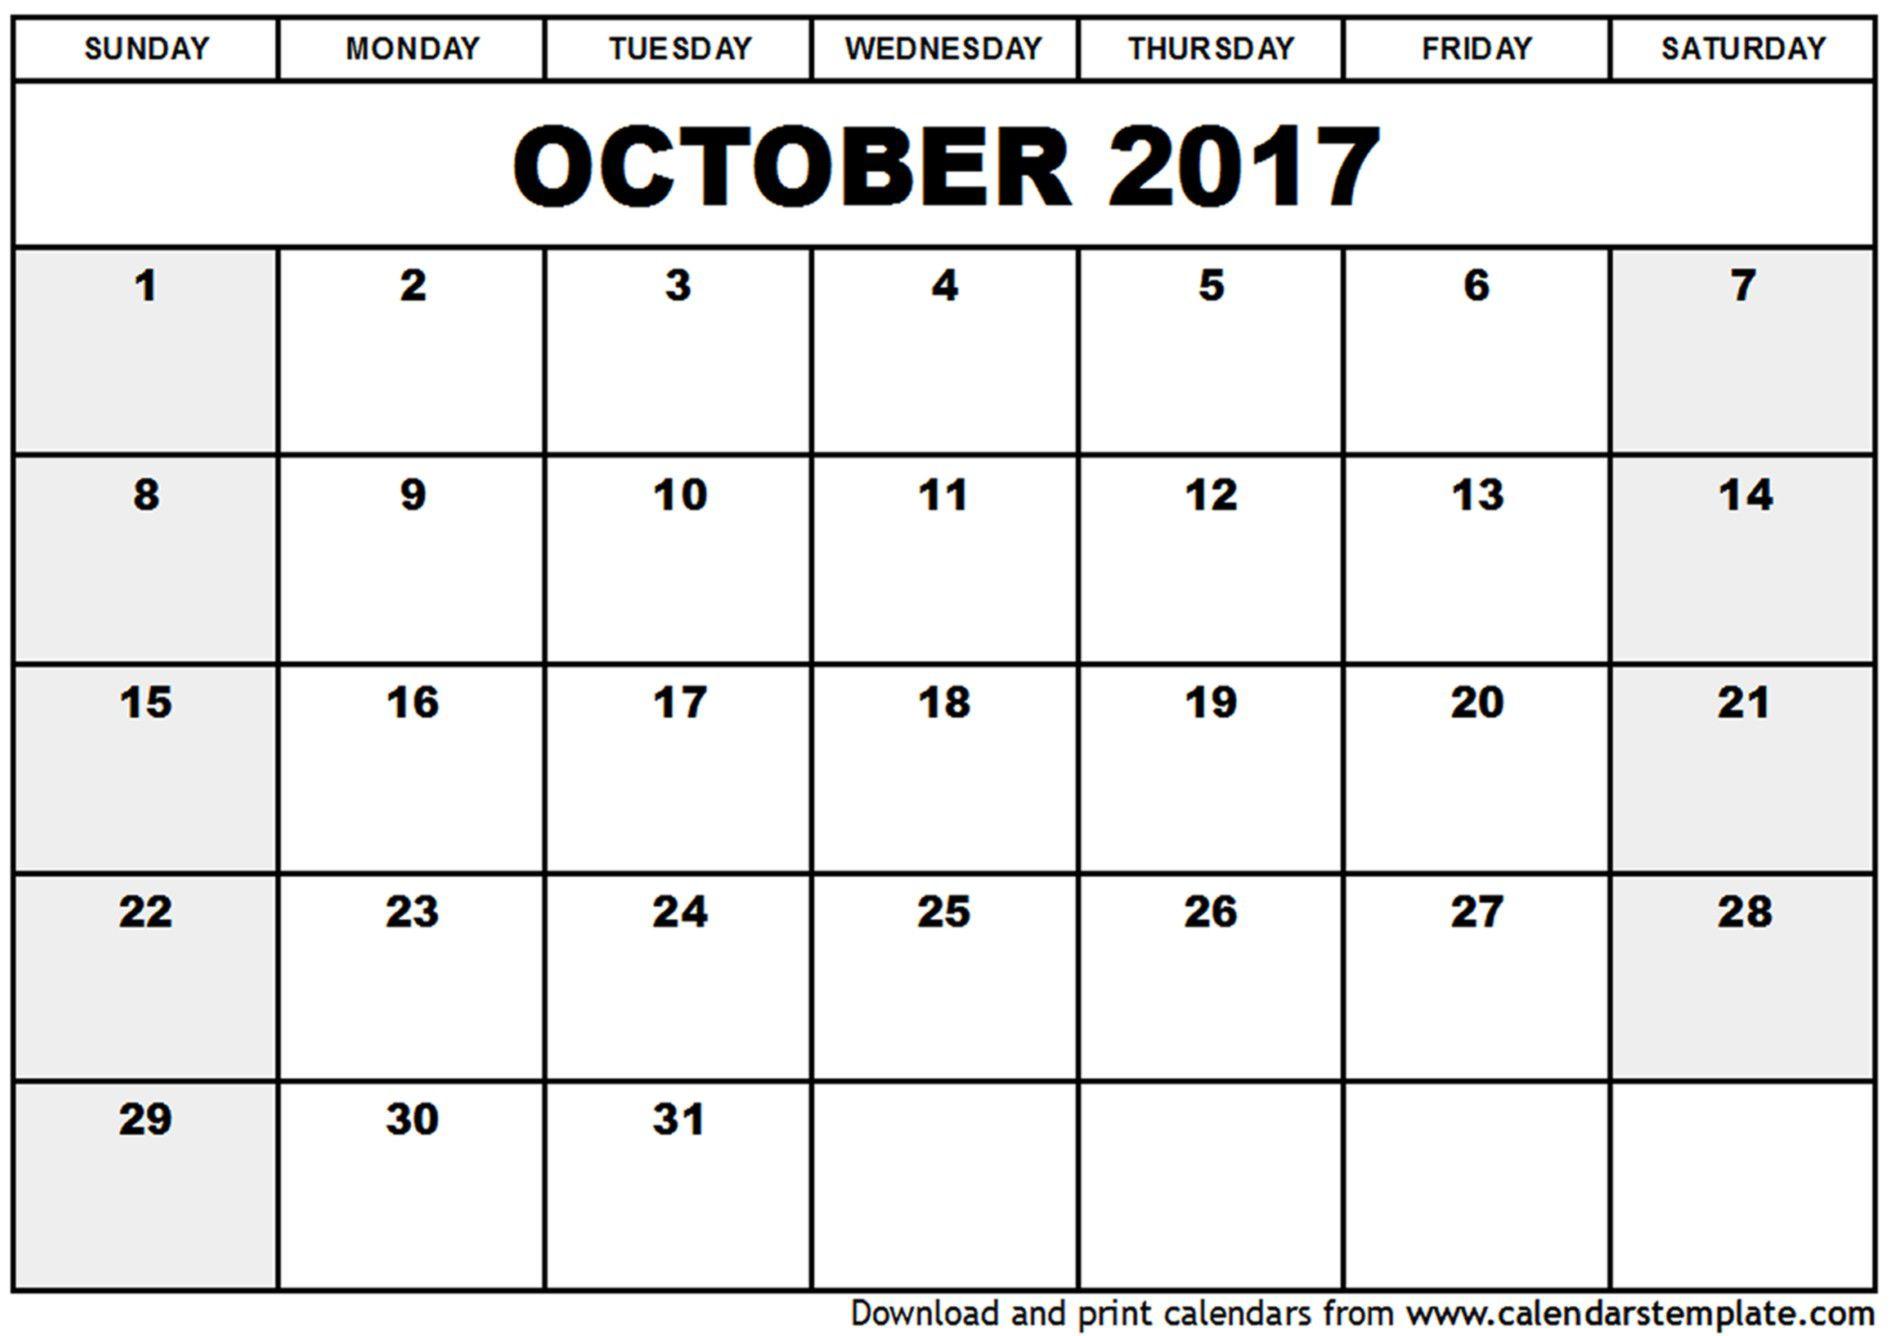 008 Impressive Google Calendar Template 2017 Design Full